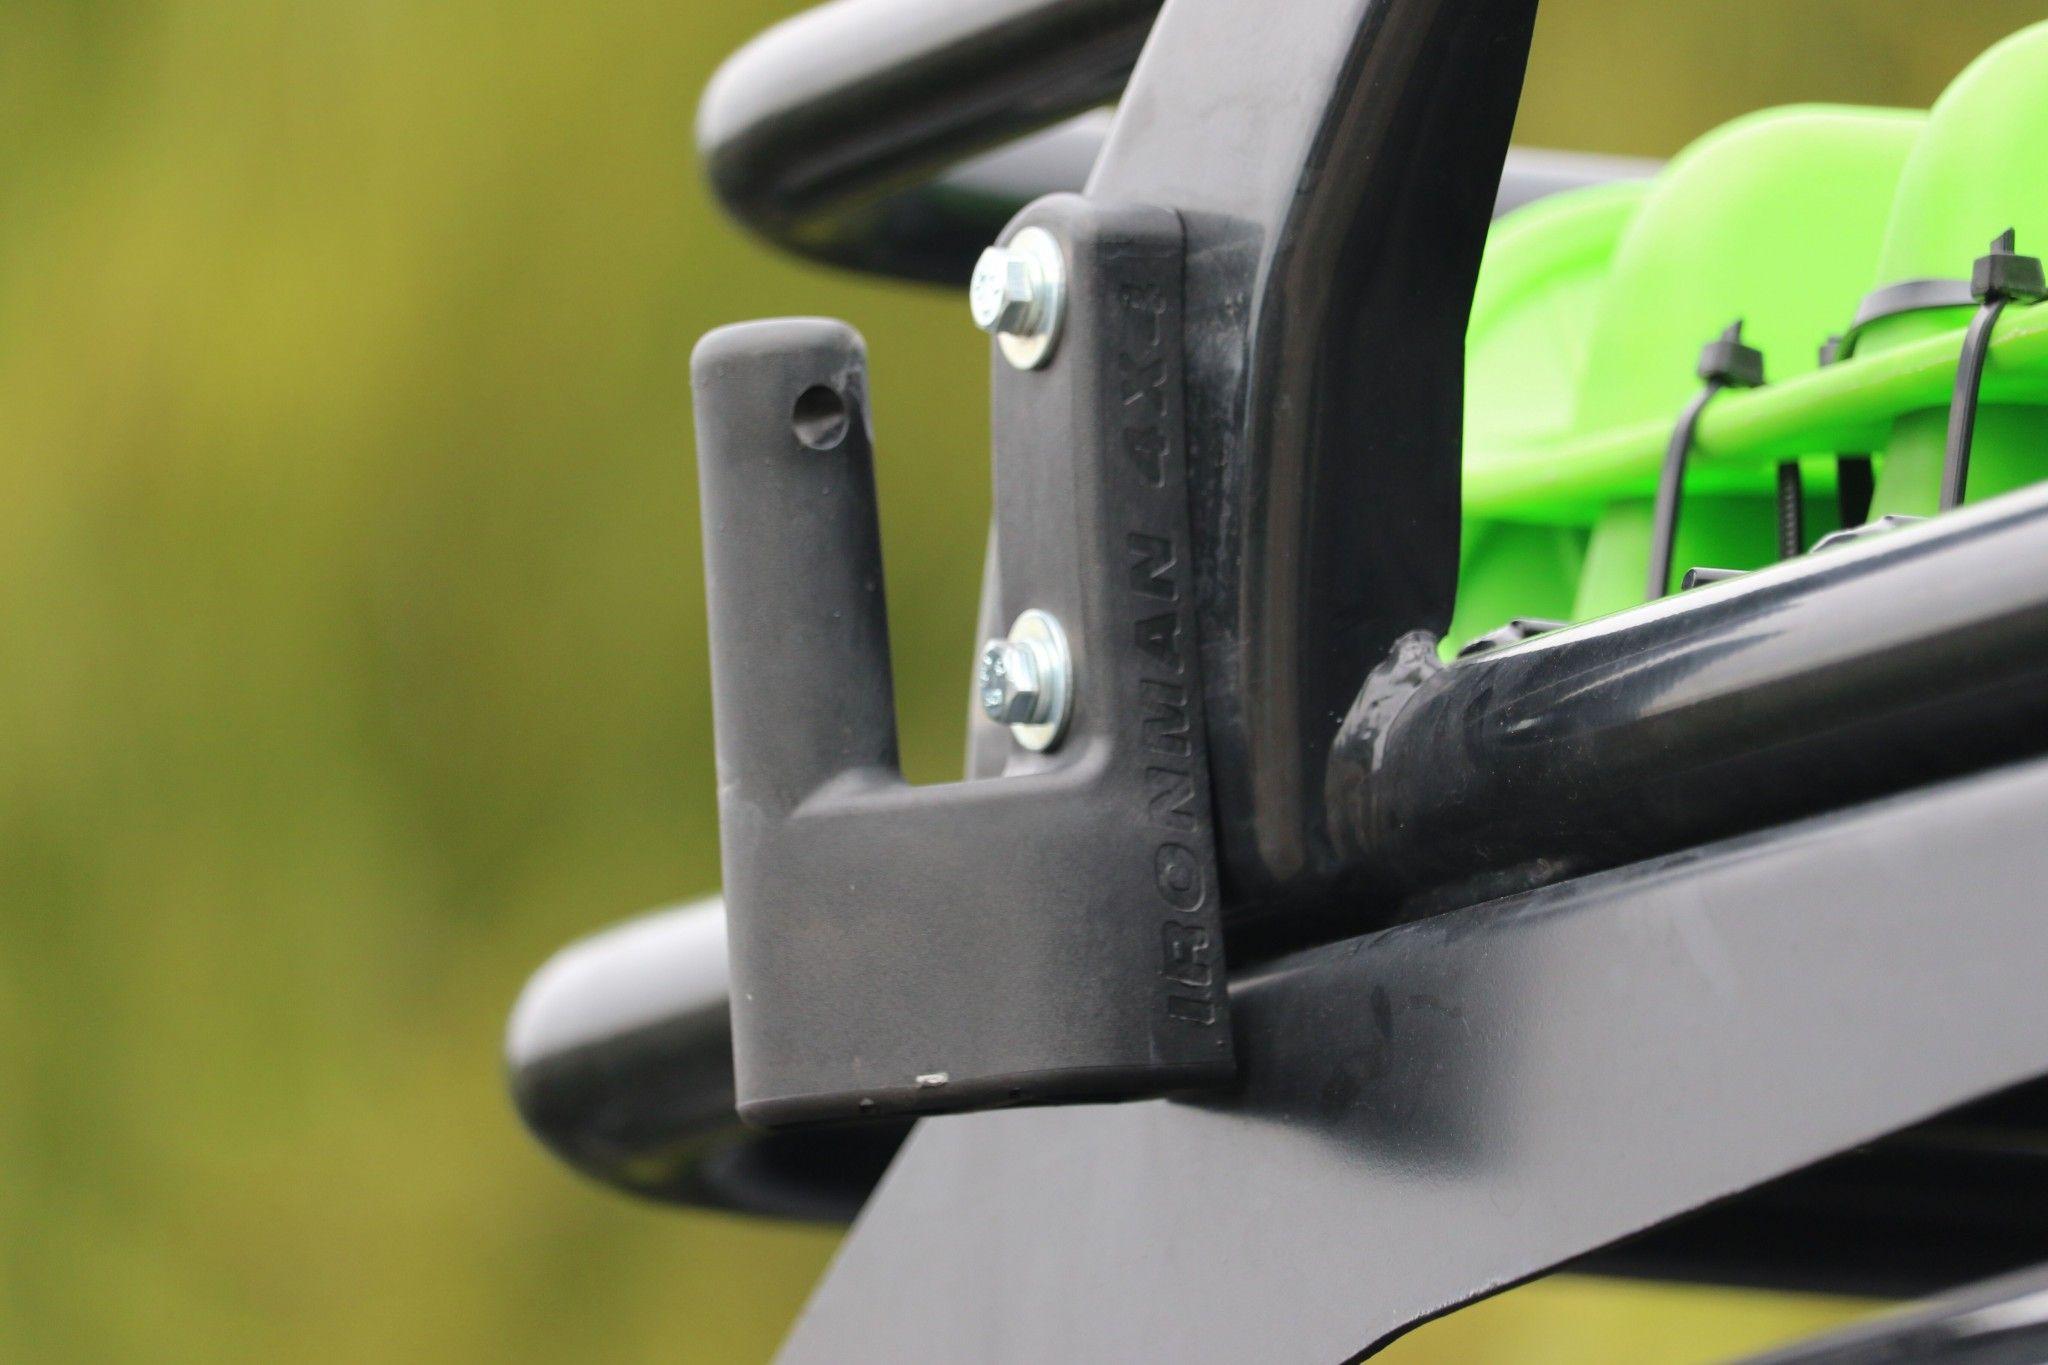 Ironman 4x4 Quick Release Awning Brackets Bracket Awning 4x4